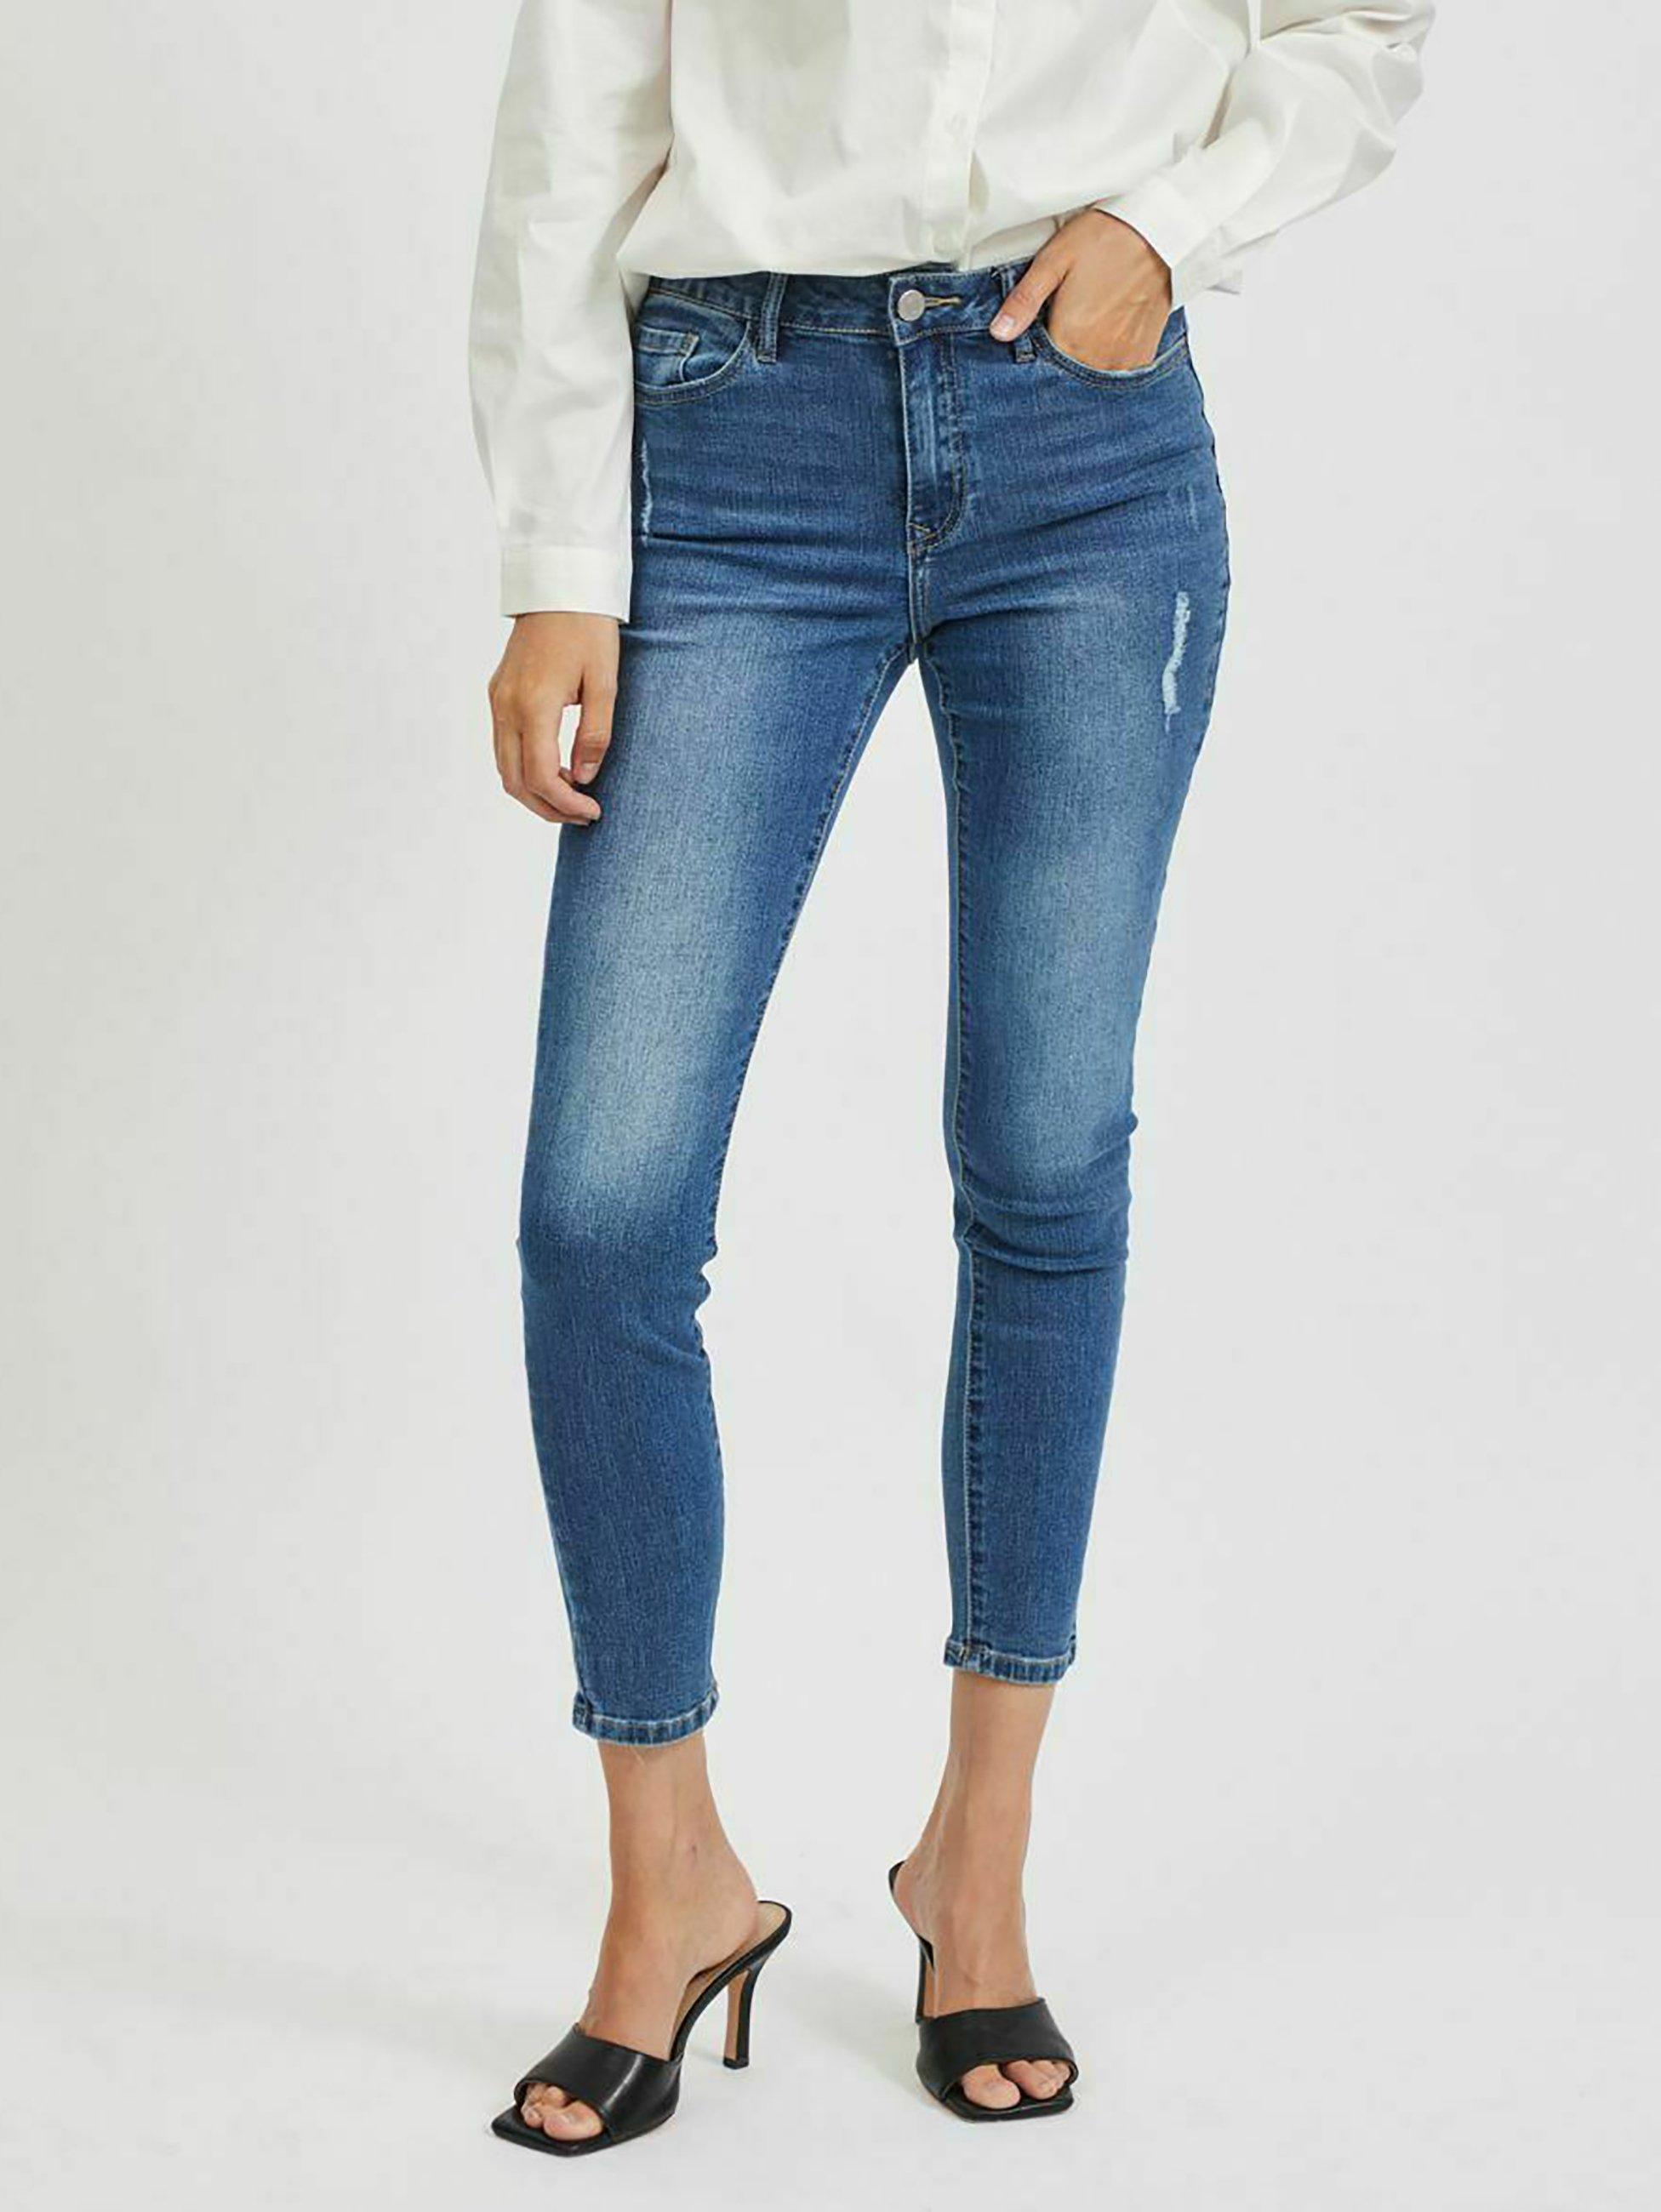 Damen Jeans Skinny Fit - medium blue denim